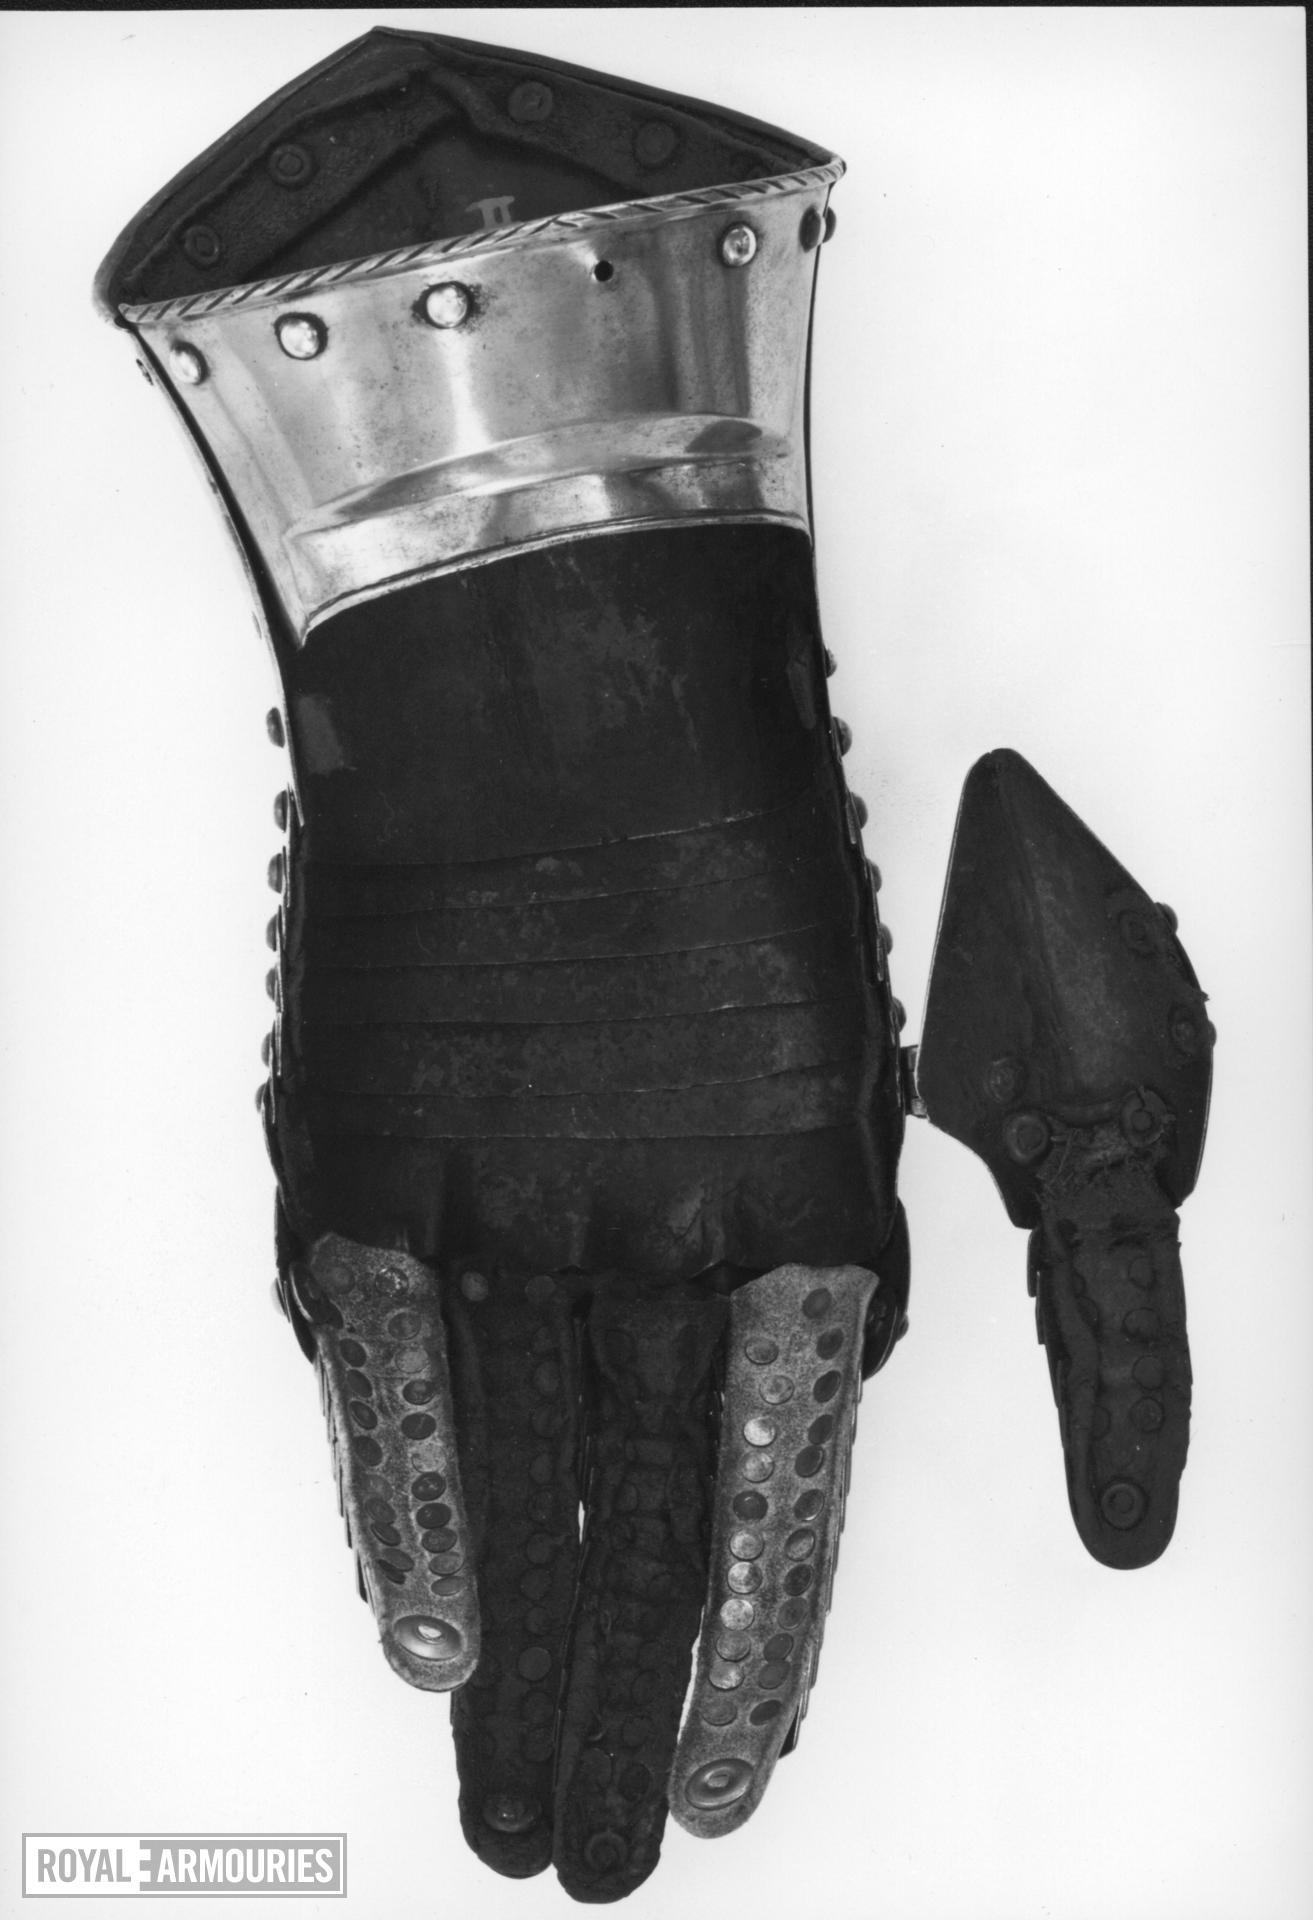 Tilt armour for the Plankengestech